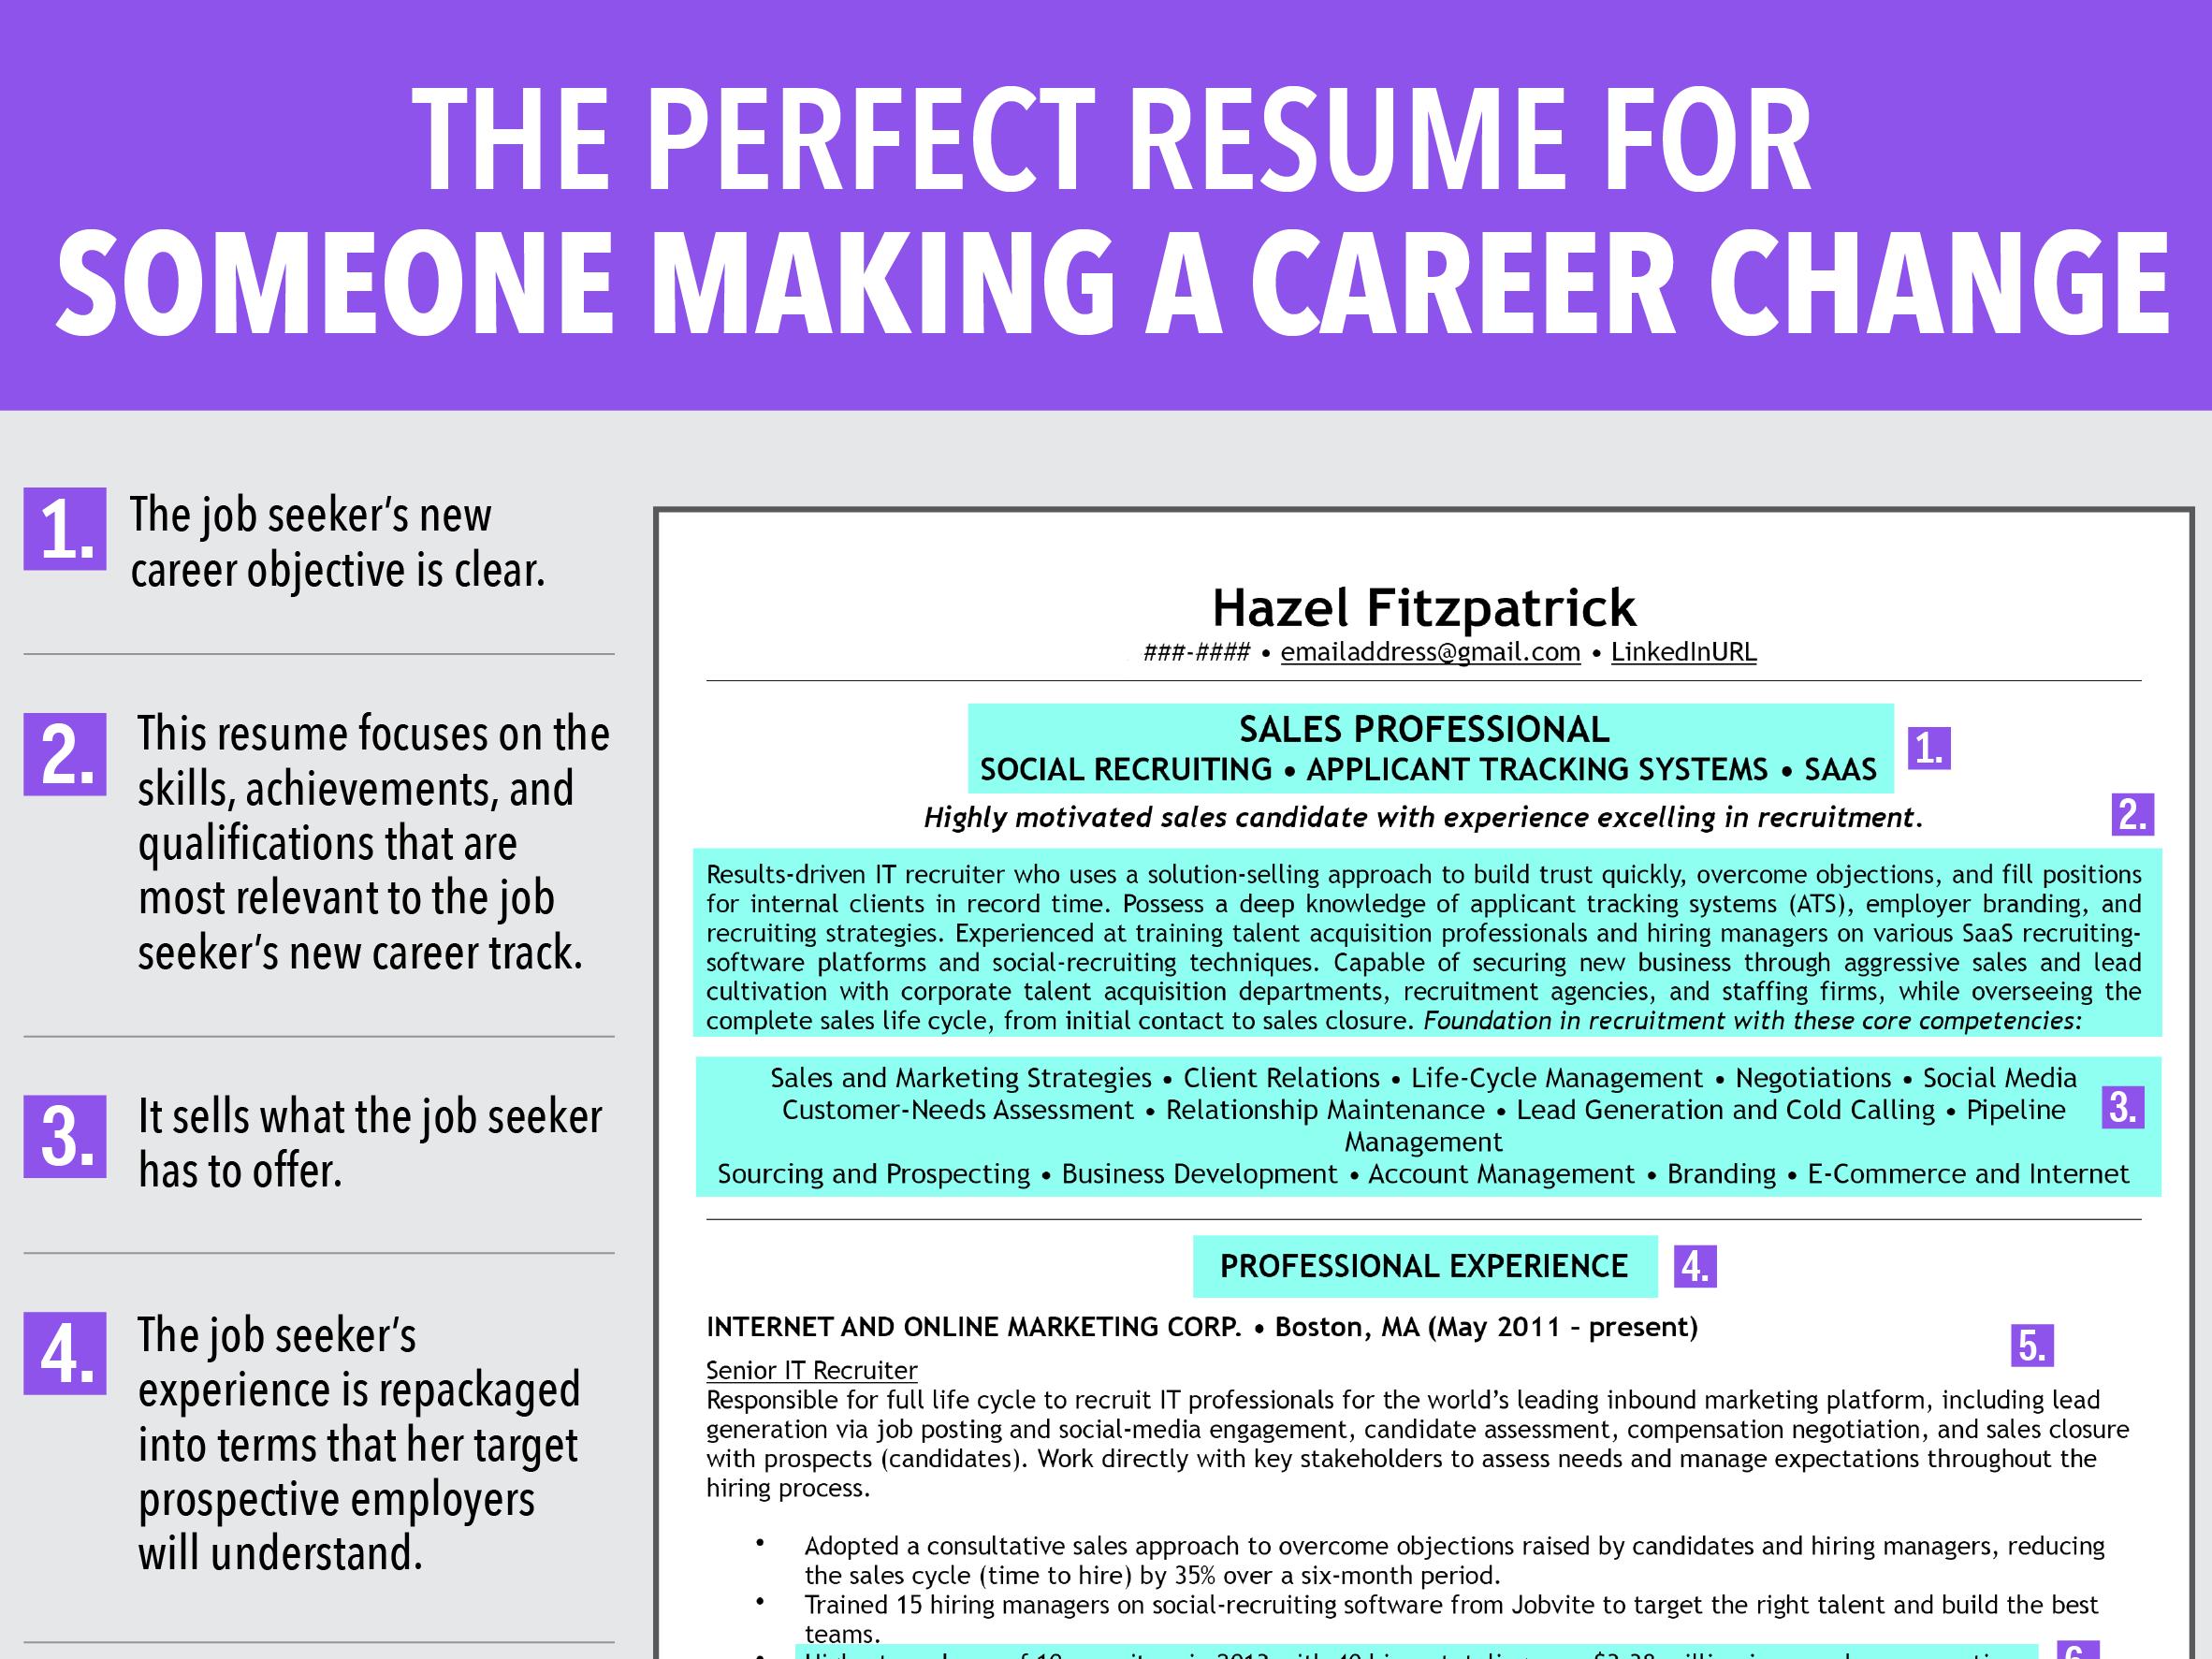 Career Change Resume Objective Does Your Resume Yells Unprofessional #resume #resumewriting